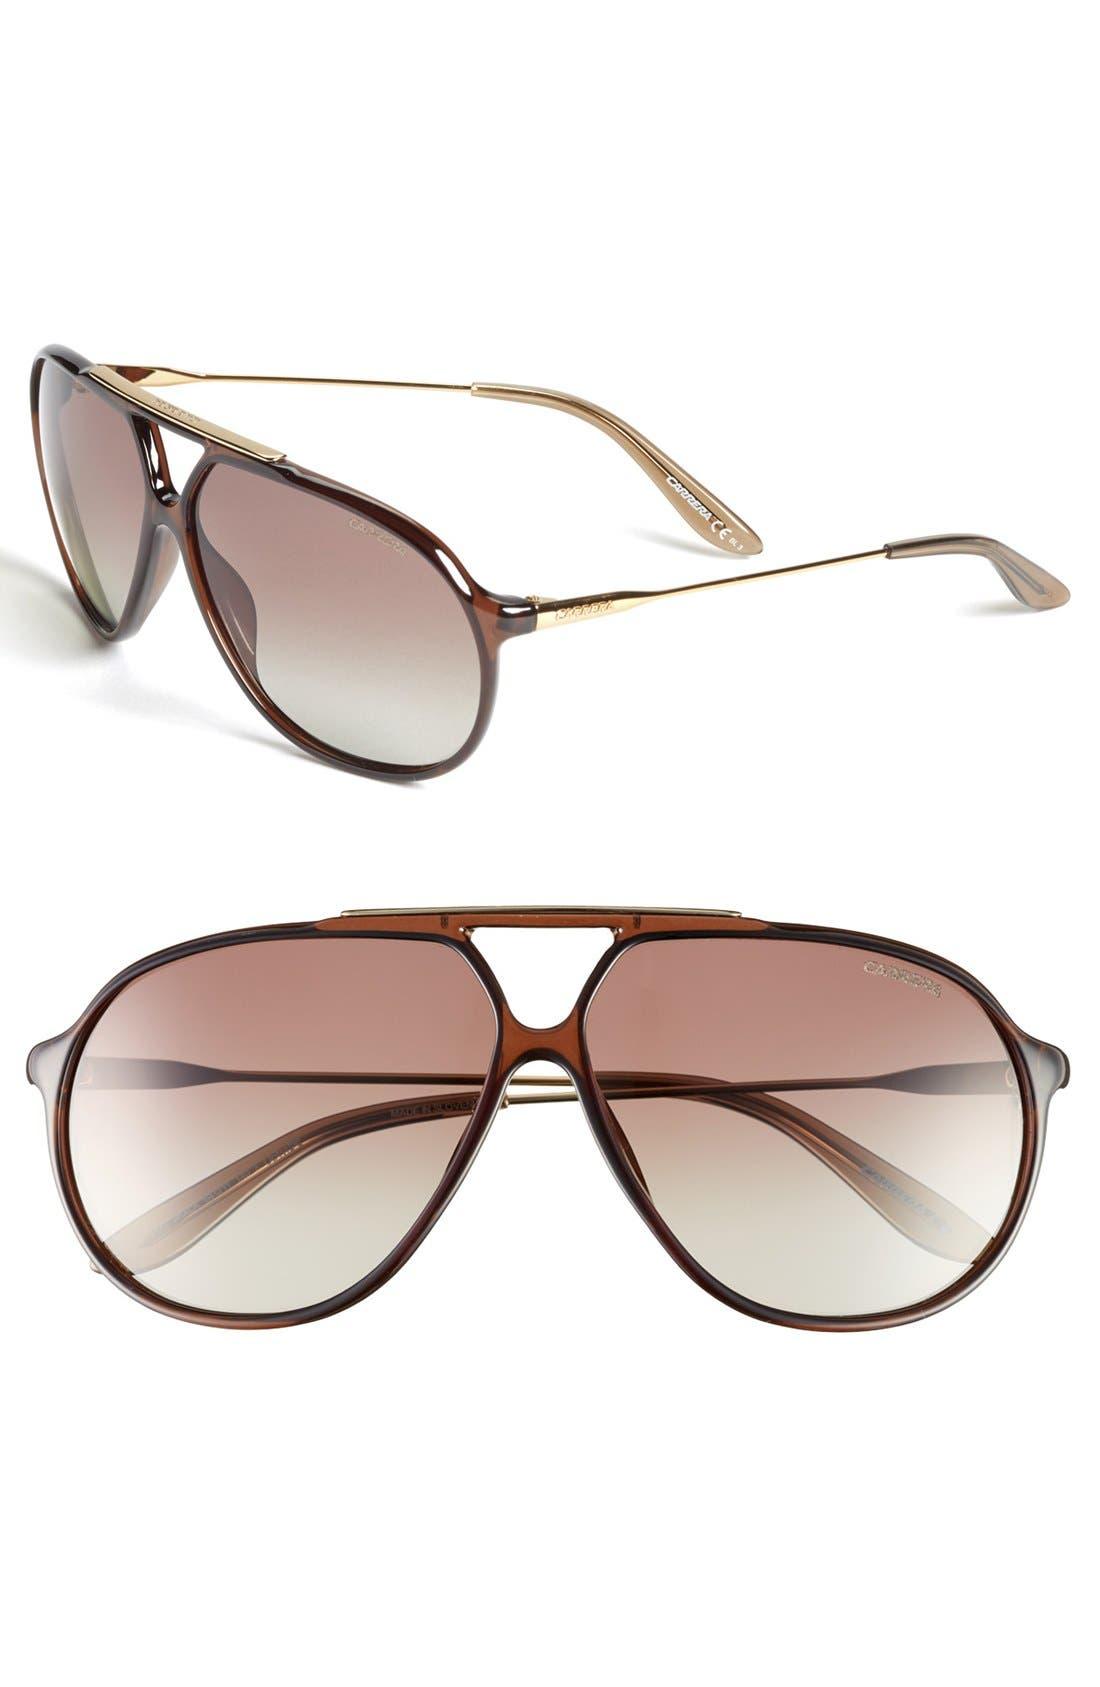 Alternate Image 1 Selected - Carrera Eyewear 64mm Polarized Aviator Sunglasses